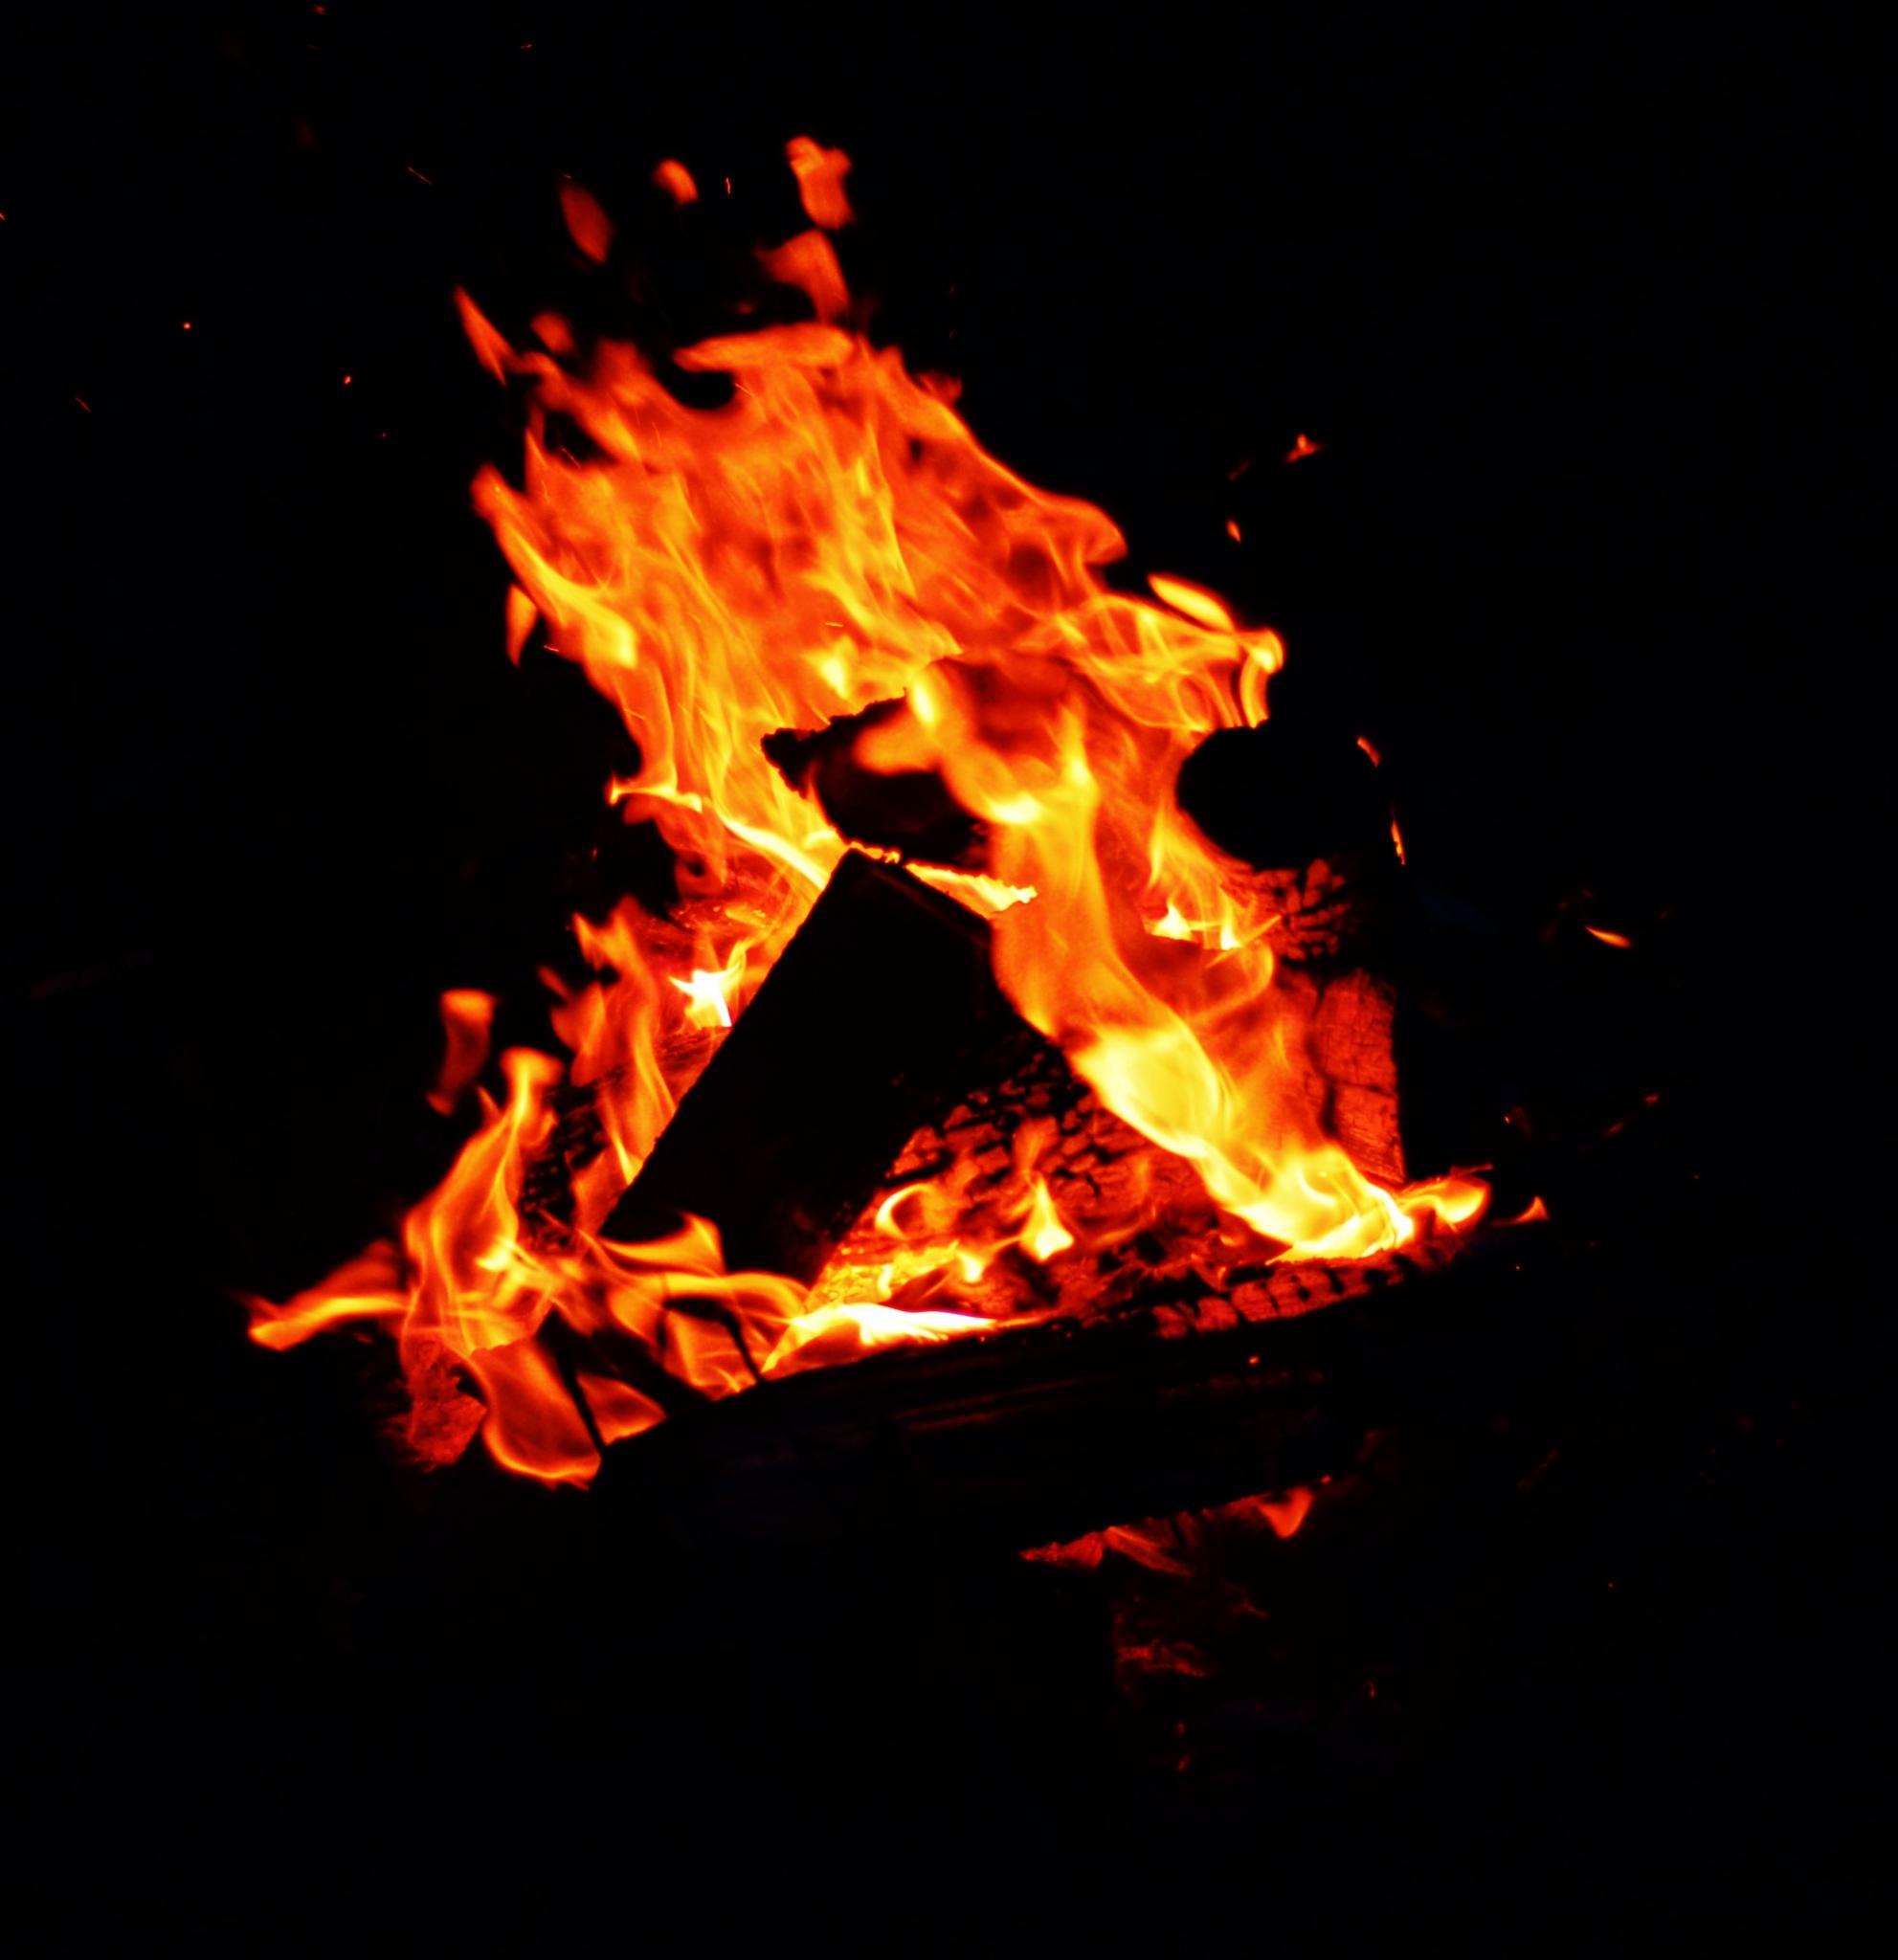 Camp Fire by Doug Fosnight